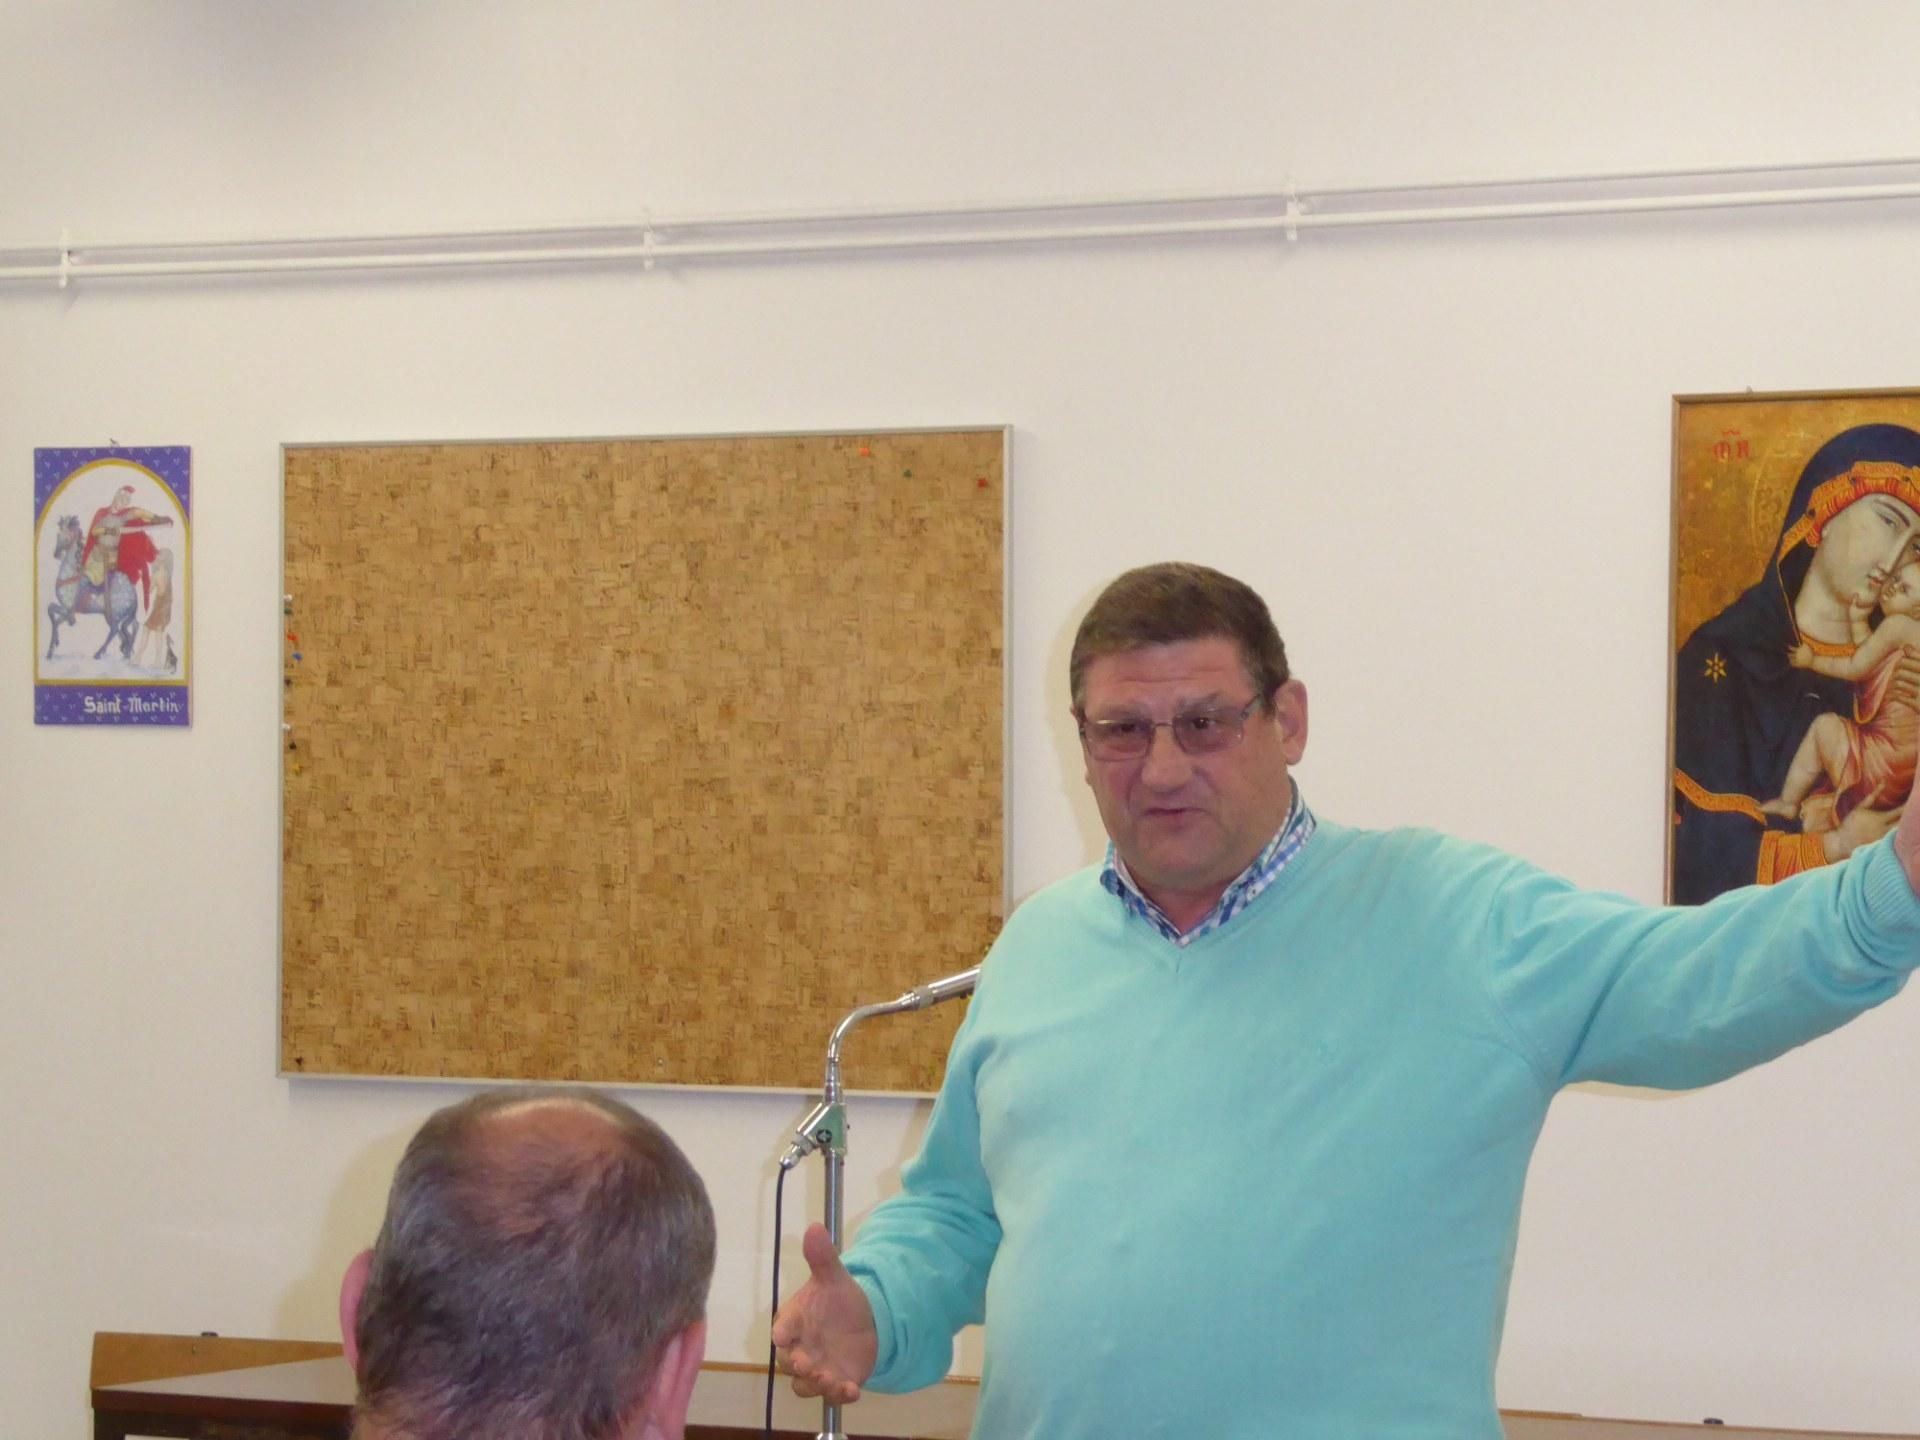 Alain Delevallée